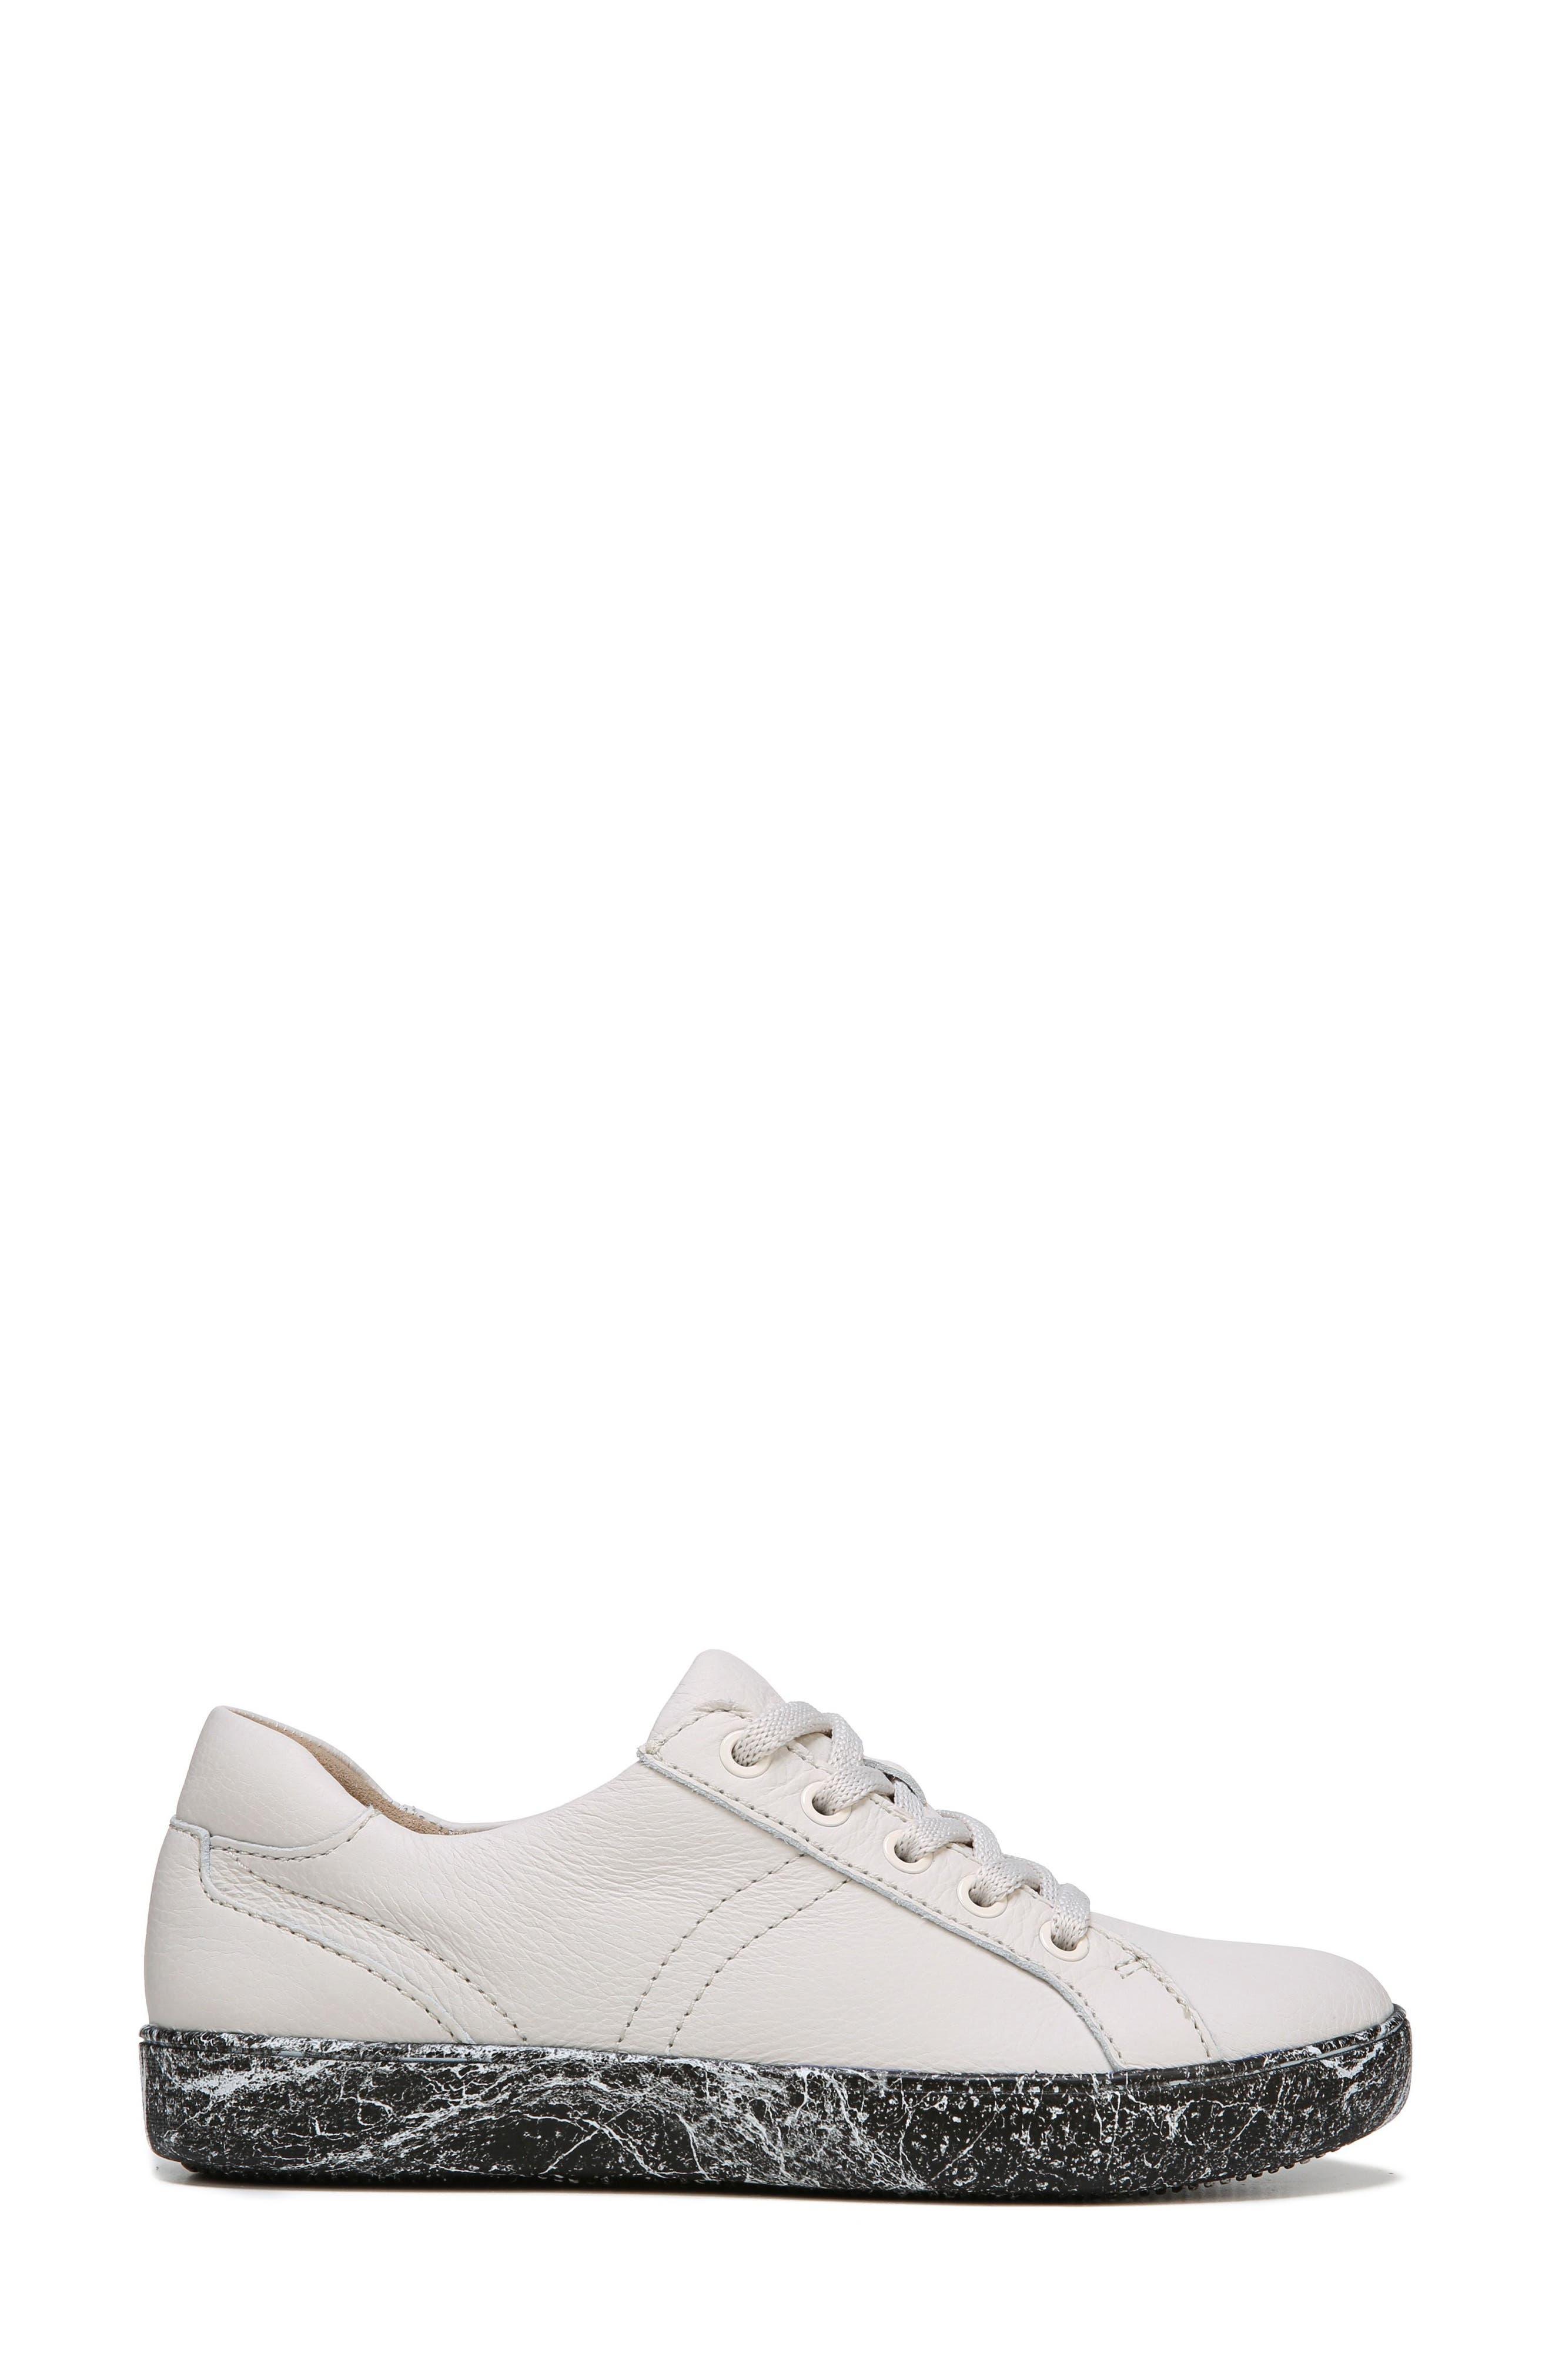 Morrison Sneaker,                             Alternate thumbnail 5, color,                             Beige Pebble Leather